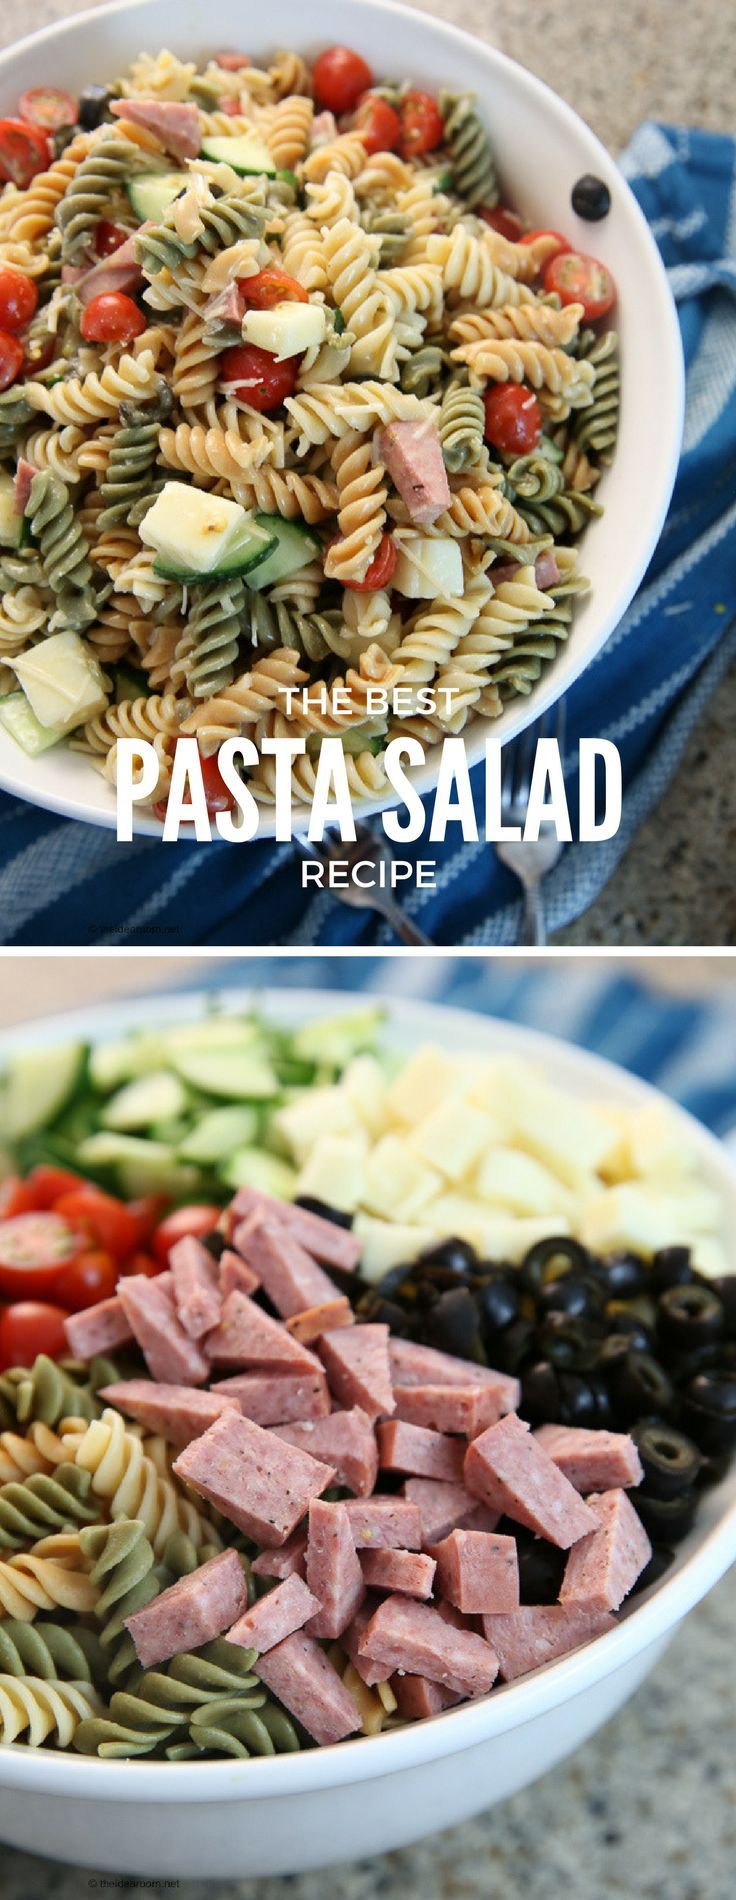 Recipes- Salad  Best Pasta Salad Recipe